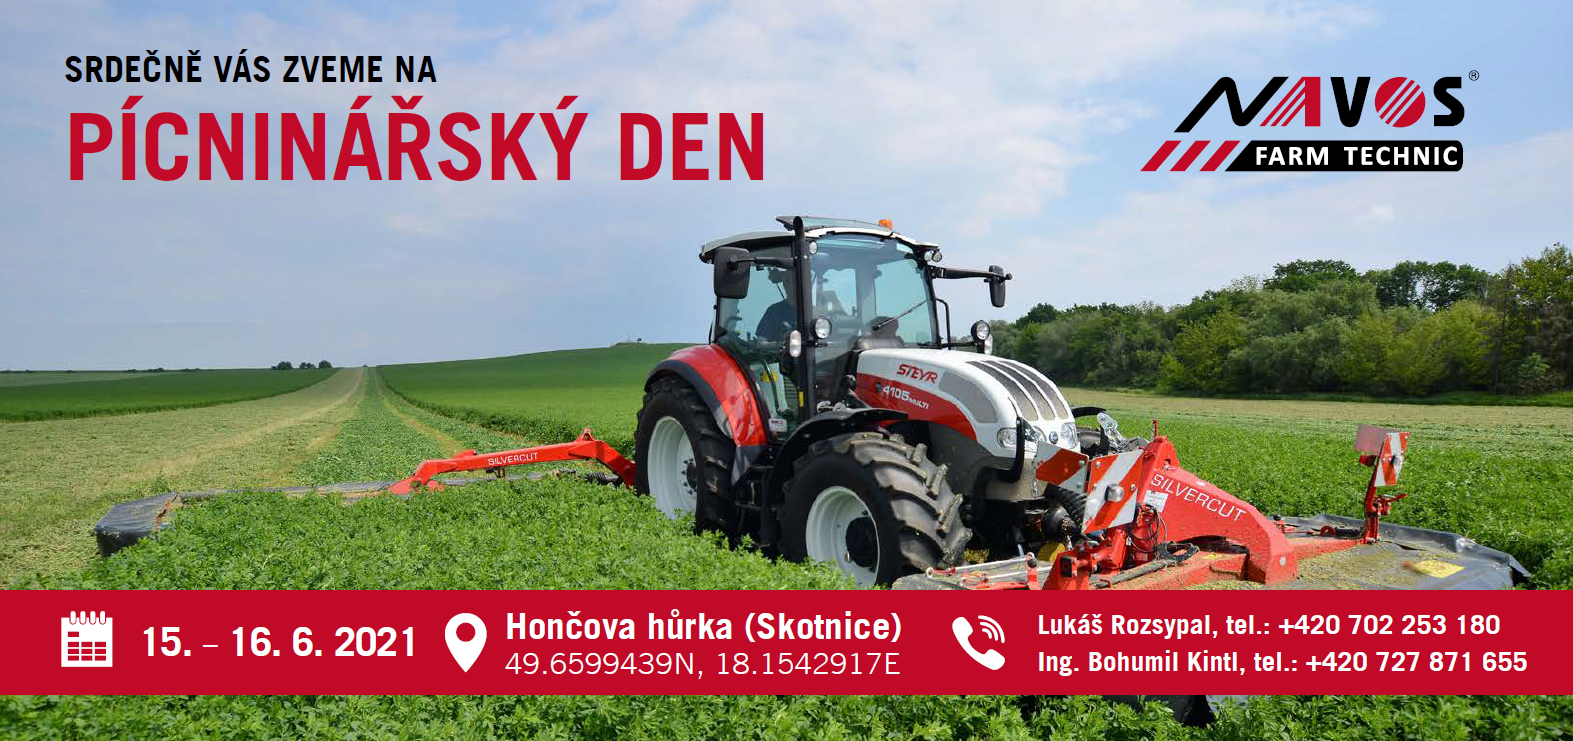 Pozvanka-SIP-STEYR-picninarsky-den.png